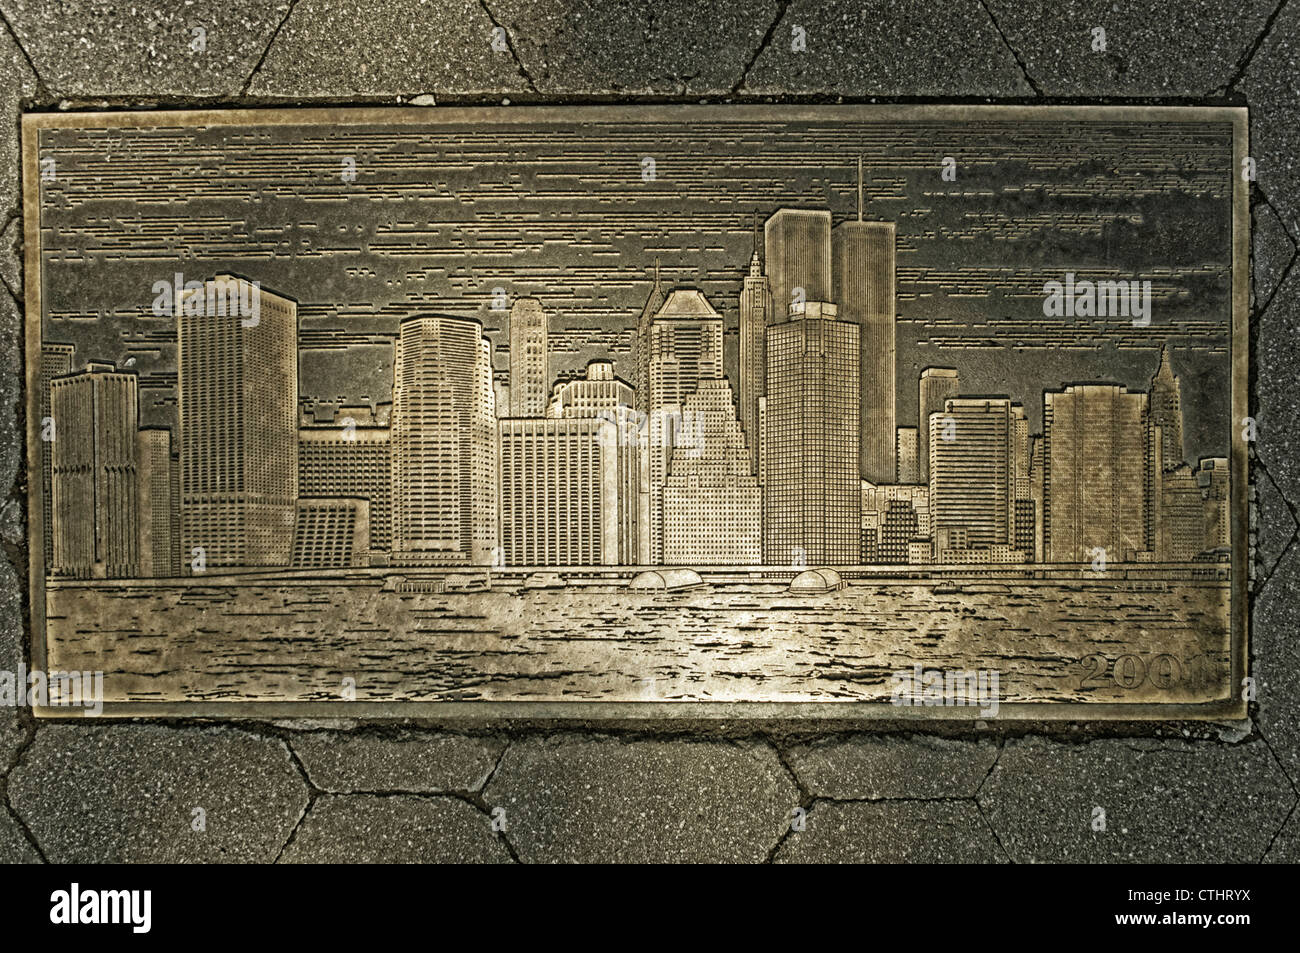 Lower Manhattan Skyline before 911 in metal plate at Brooklyn Heights Promenade - Stock Image